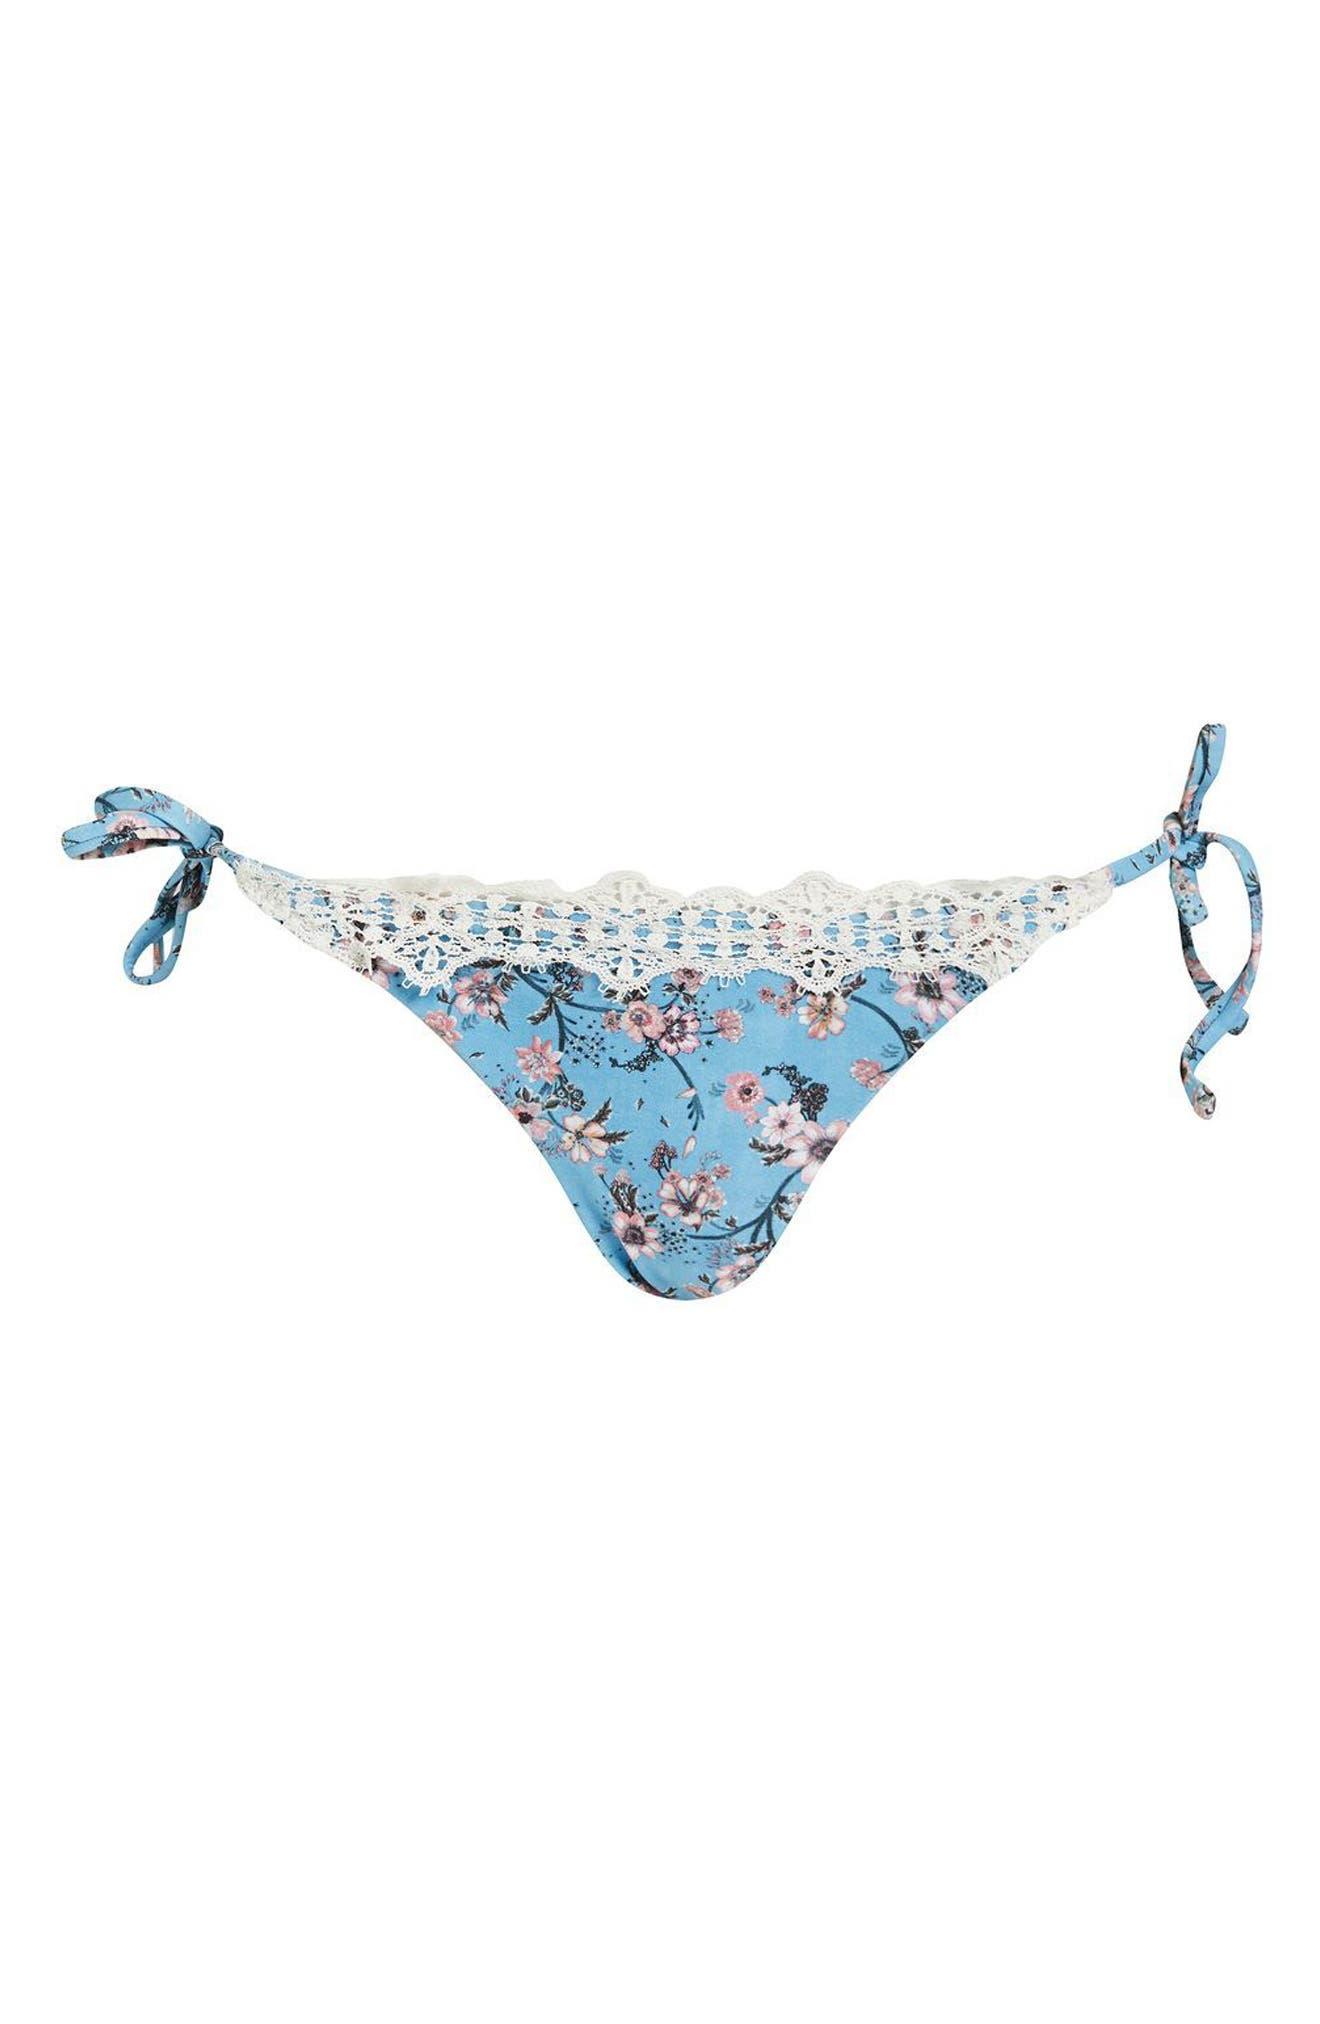 Ditsy Lace Trim Tie Side Bikini Bottoms,                         Main,                         color, Blue Multi